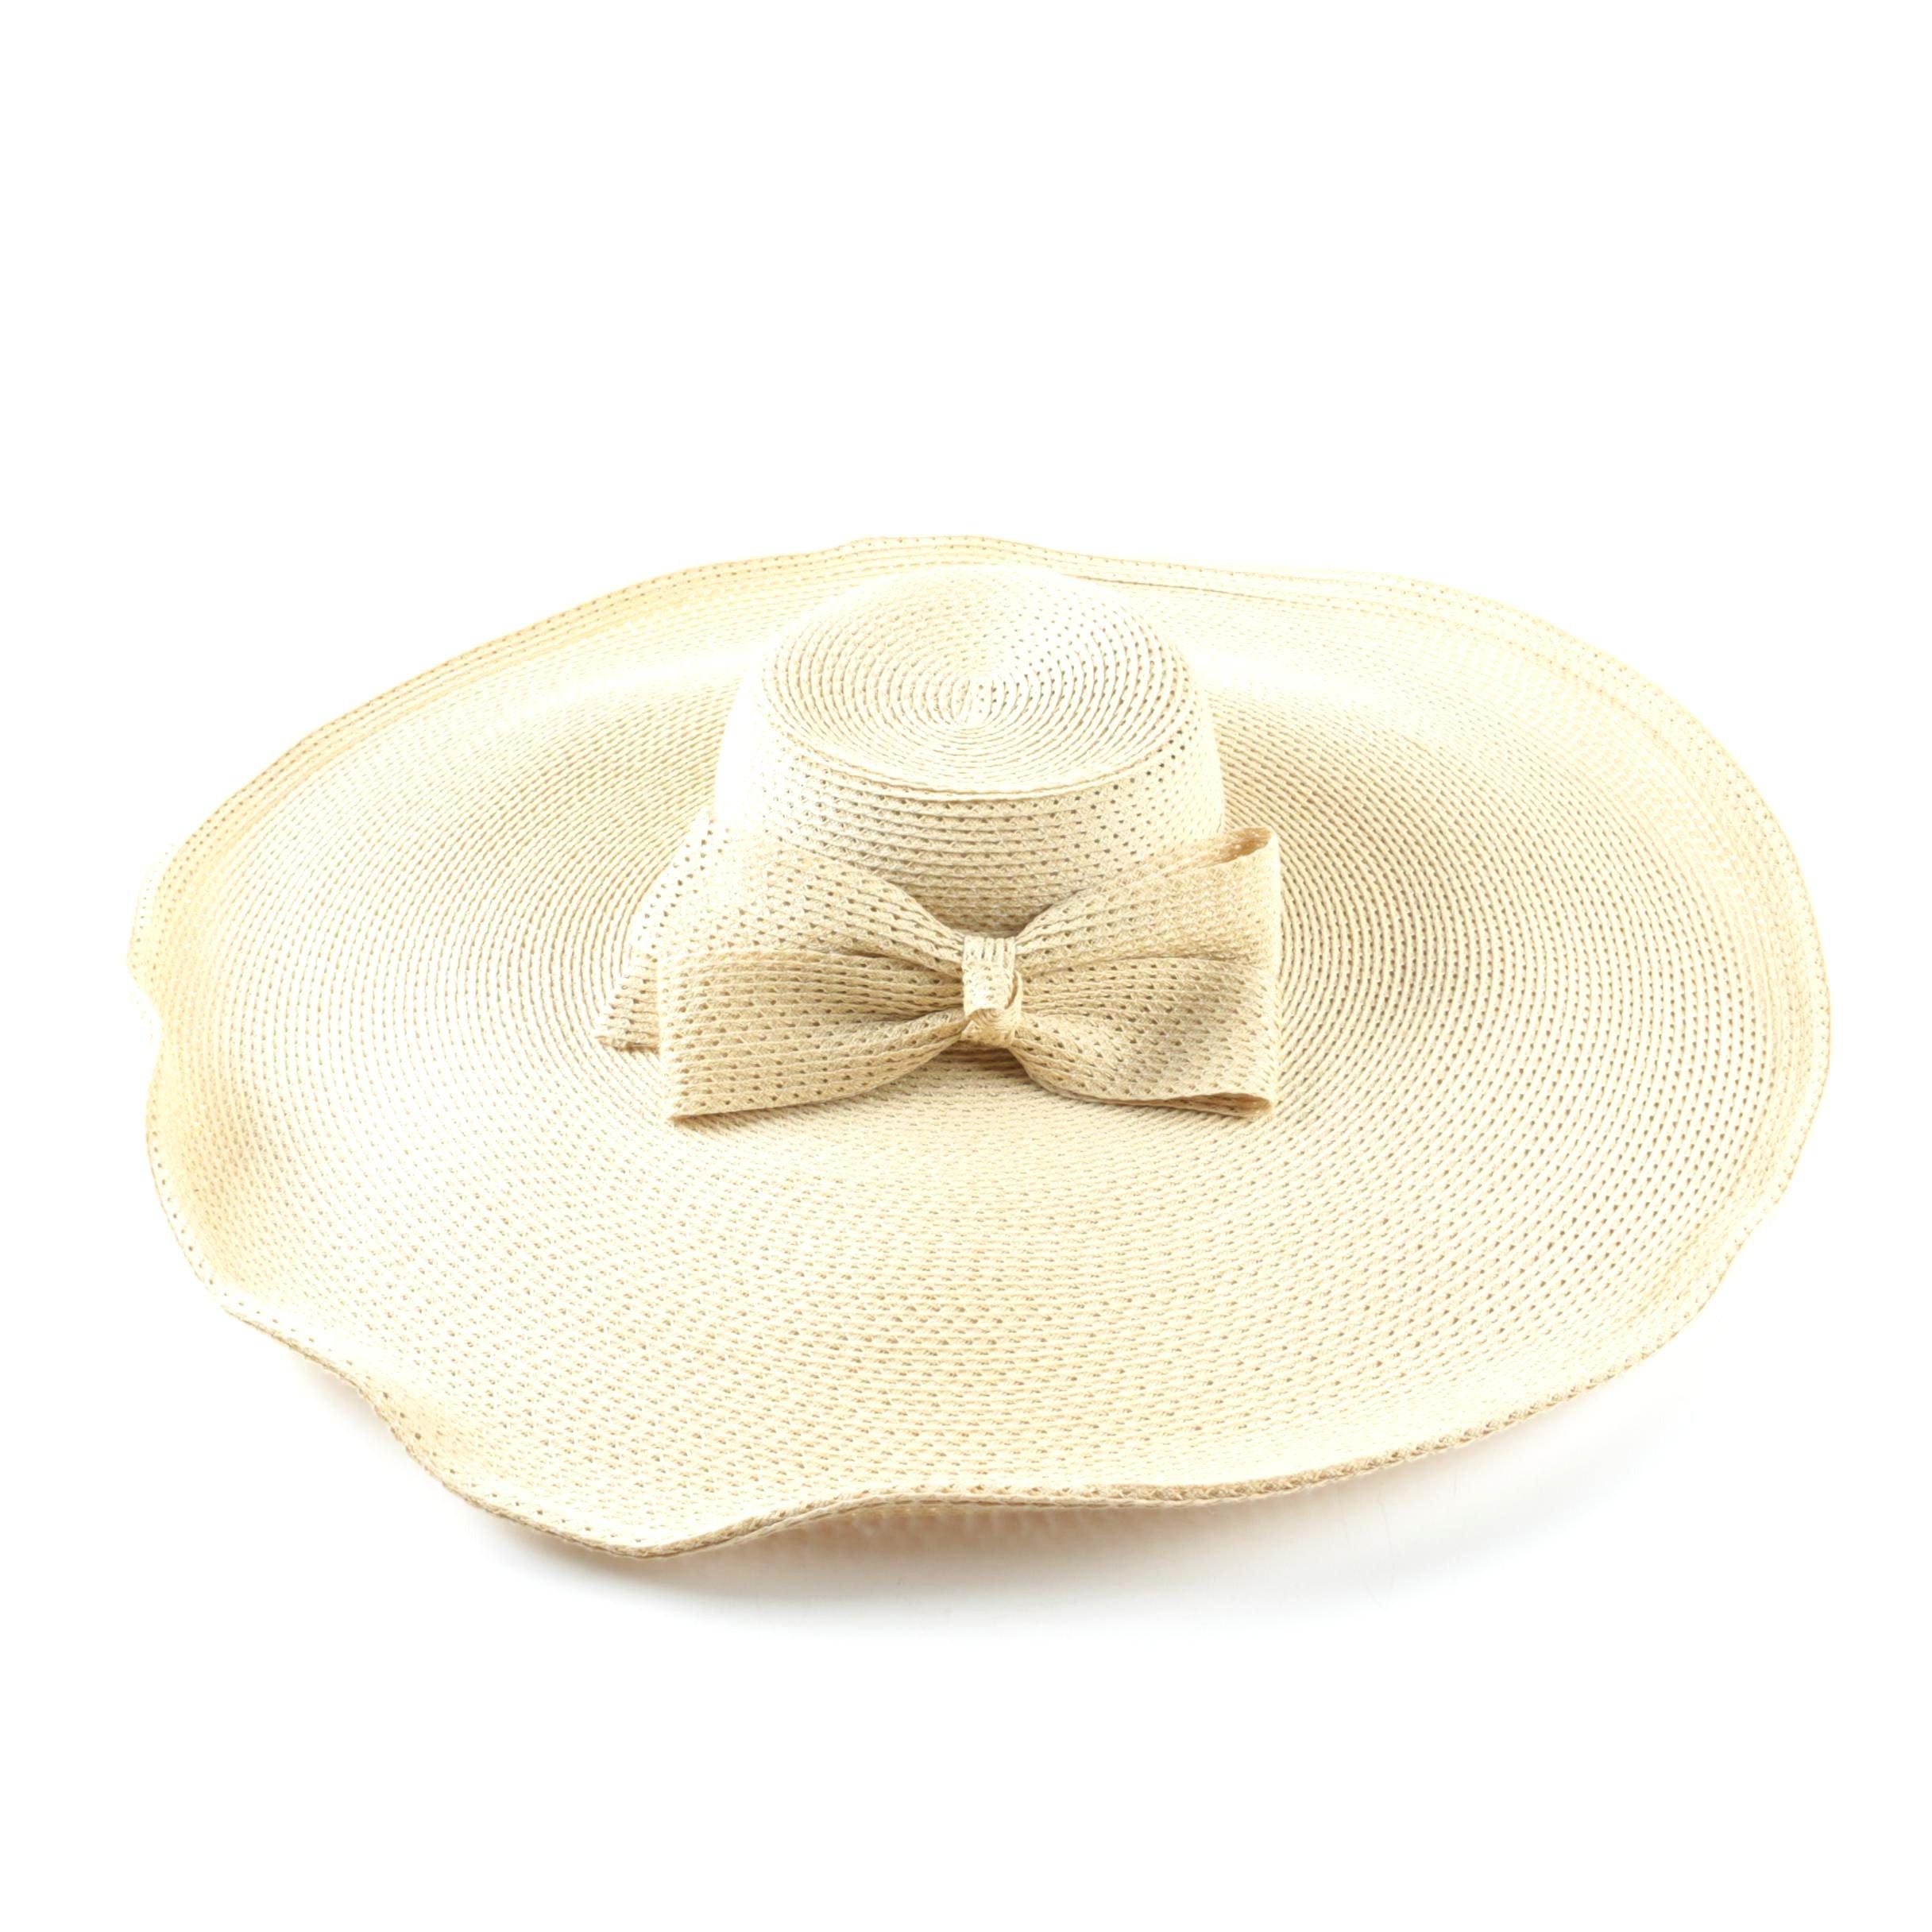 Women's Kokin of New York hand Woven Straw Wide Brimmed Sun Hat